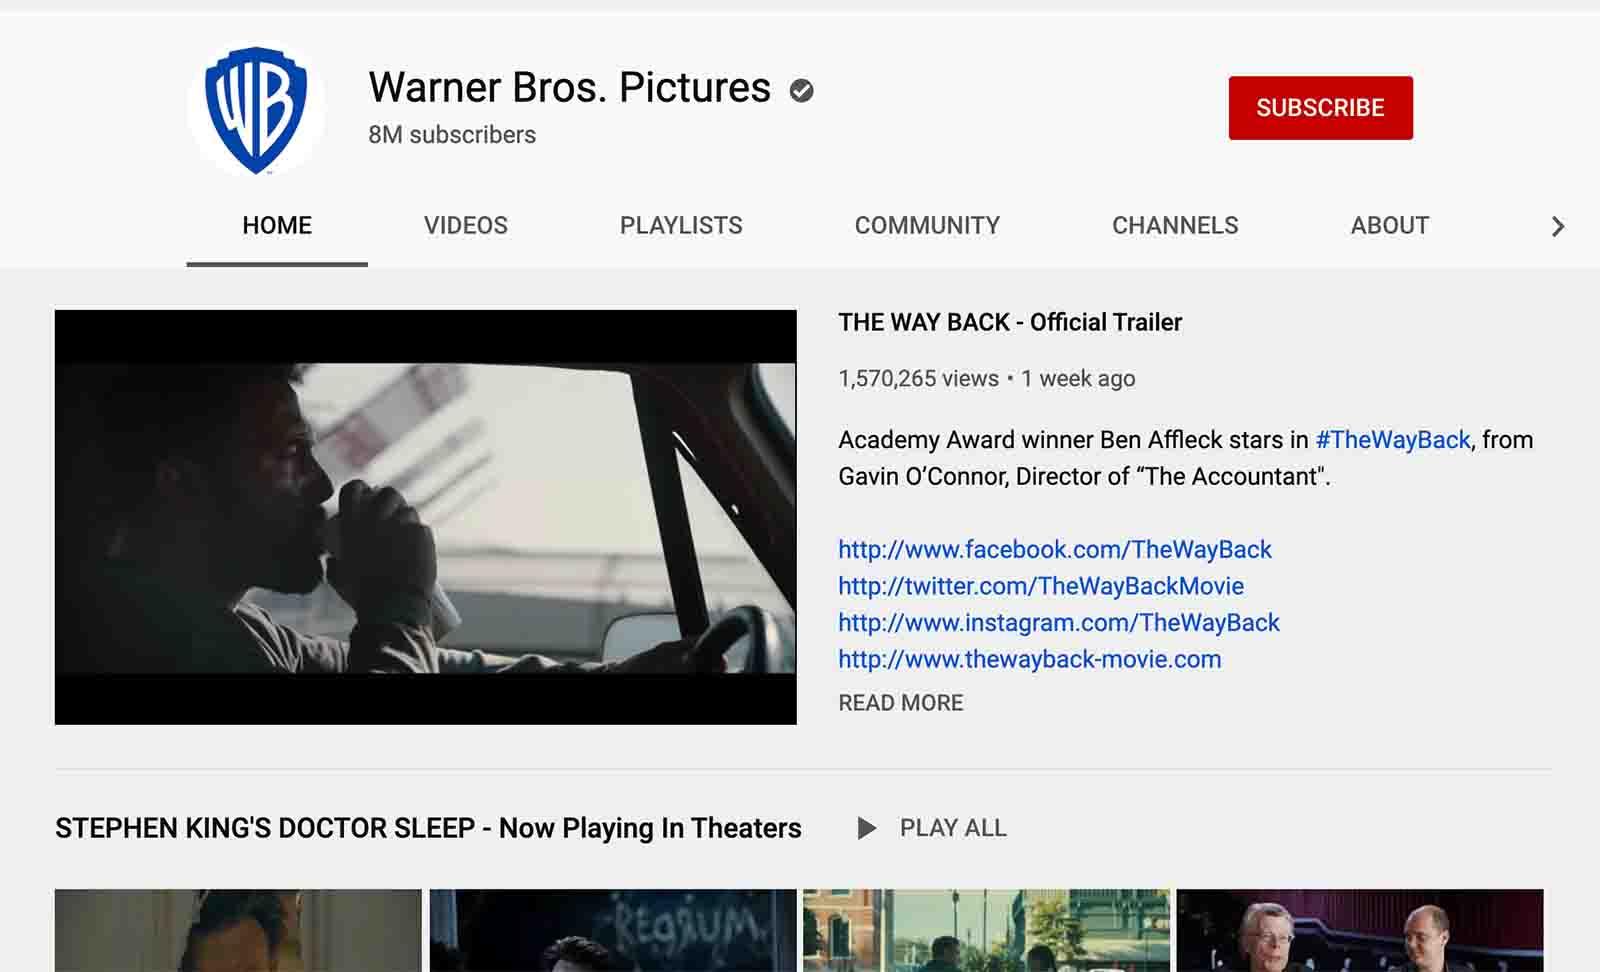 Warner Bro. YouTube channel